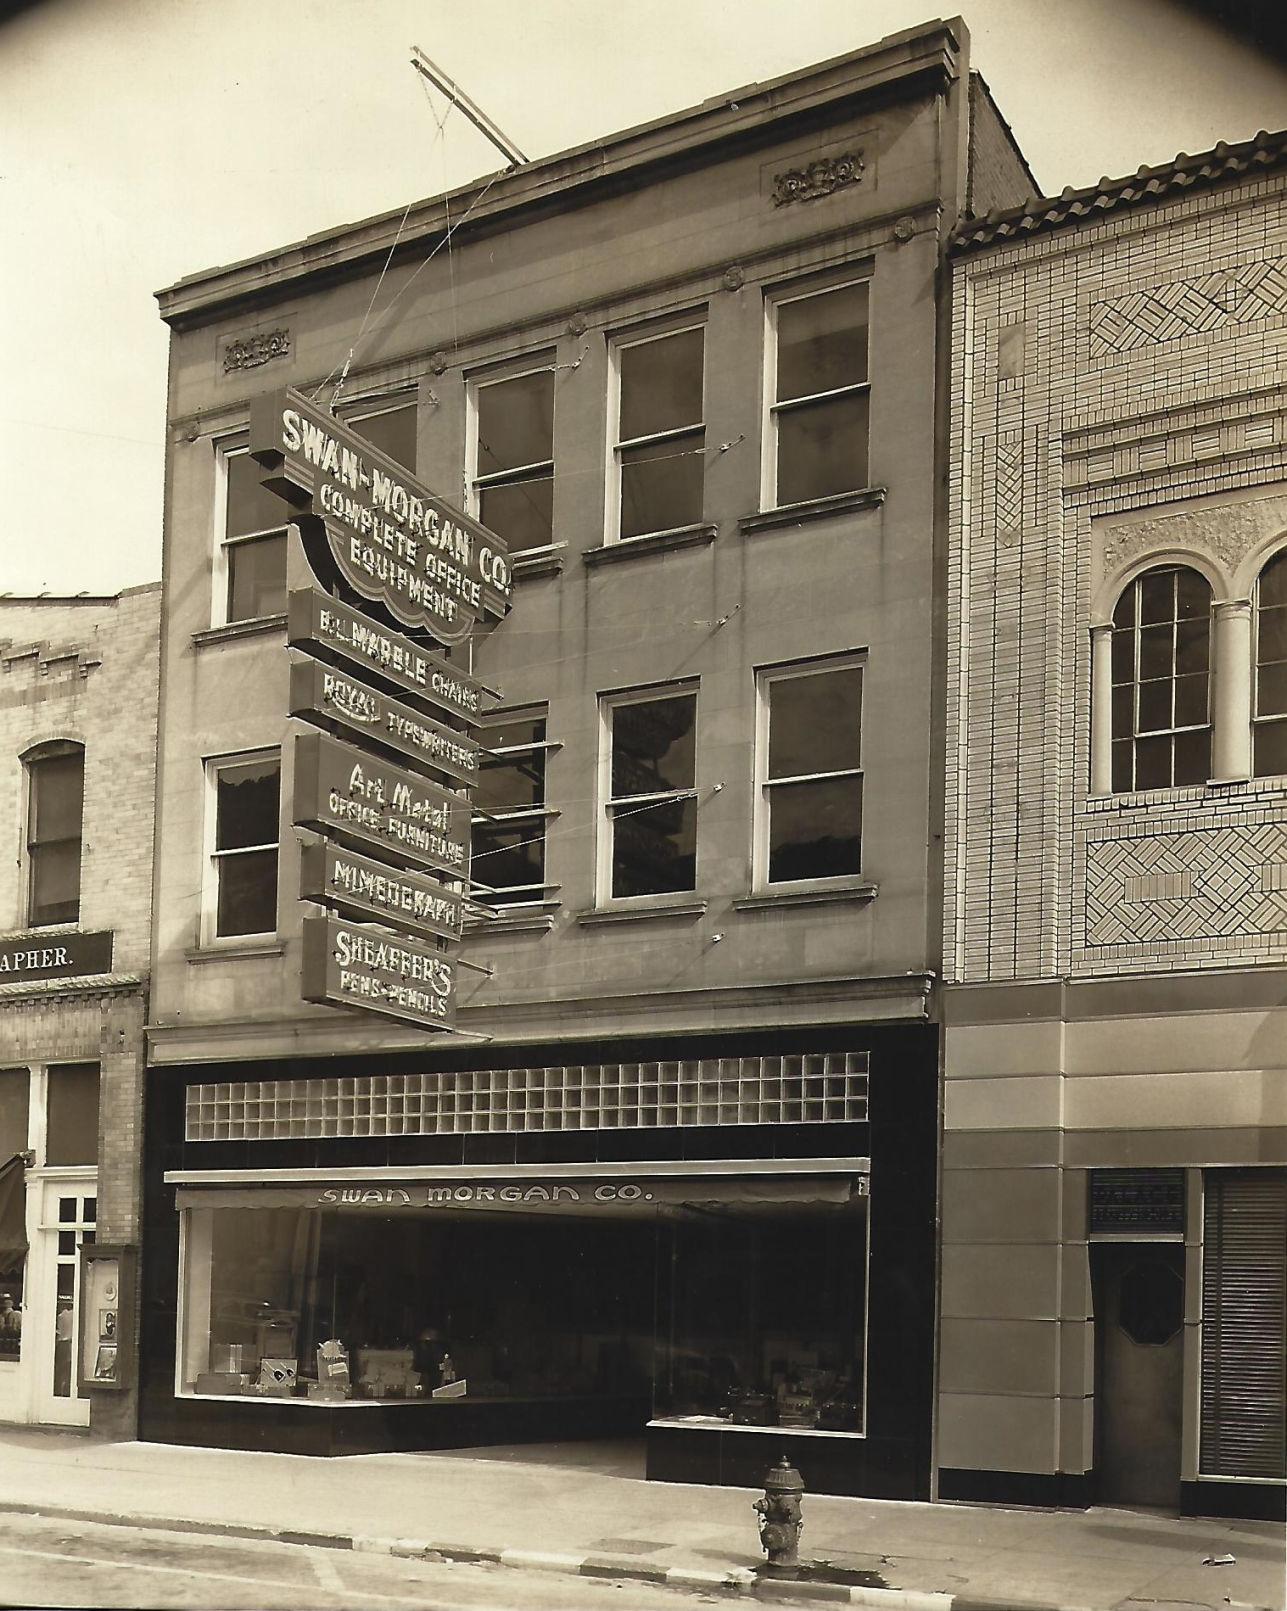 Lost Huntington: The Swan-Morgan Co.